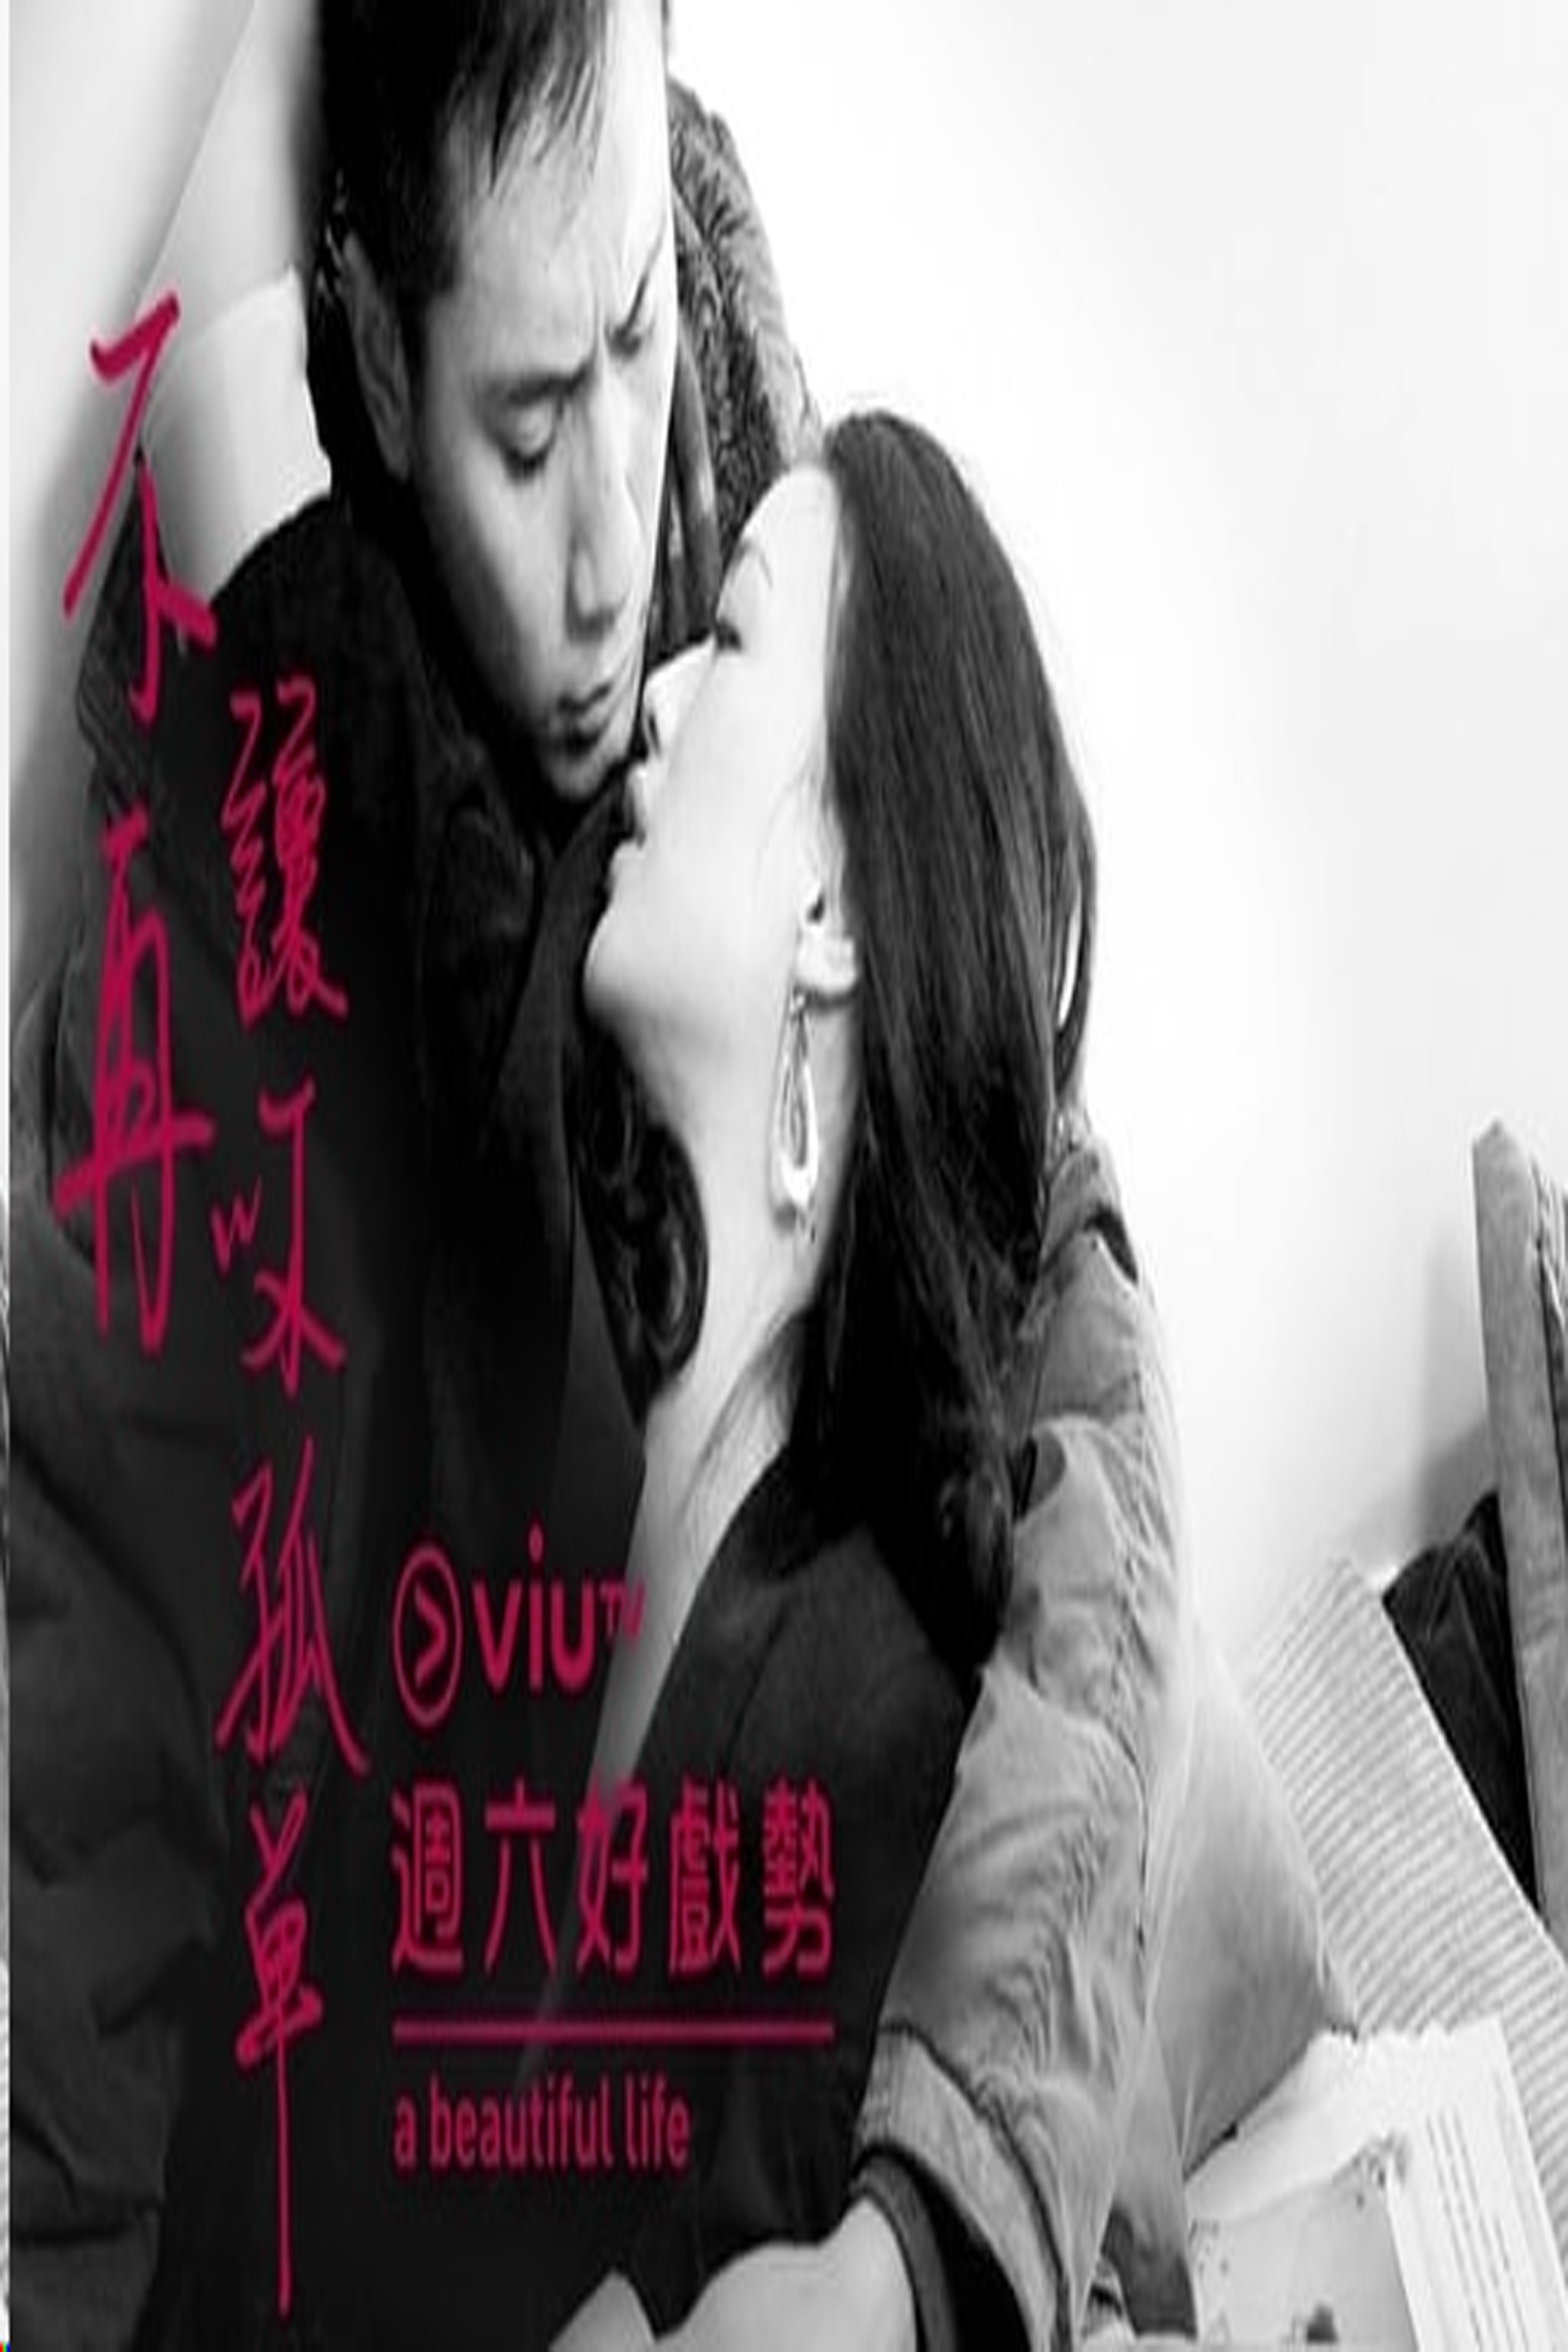 A Beautiful Life (Cantonese) - 不再让你孤单